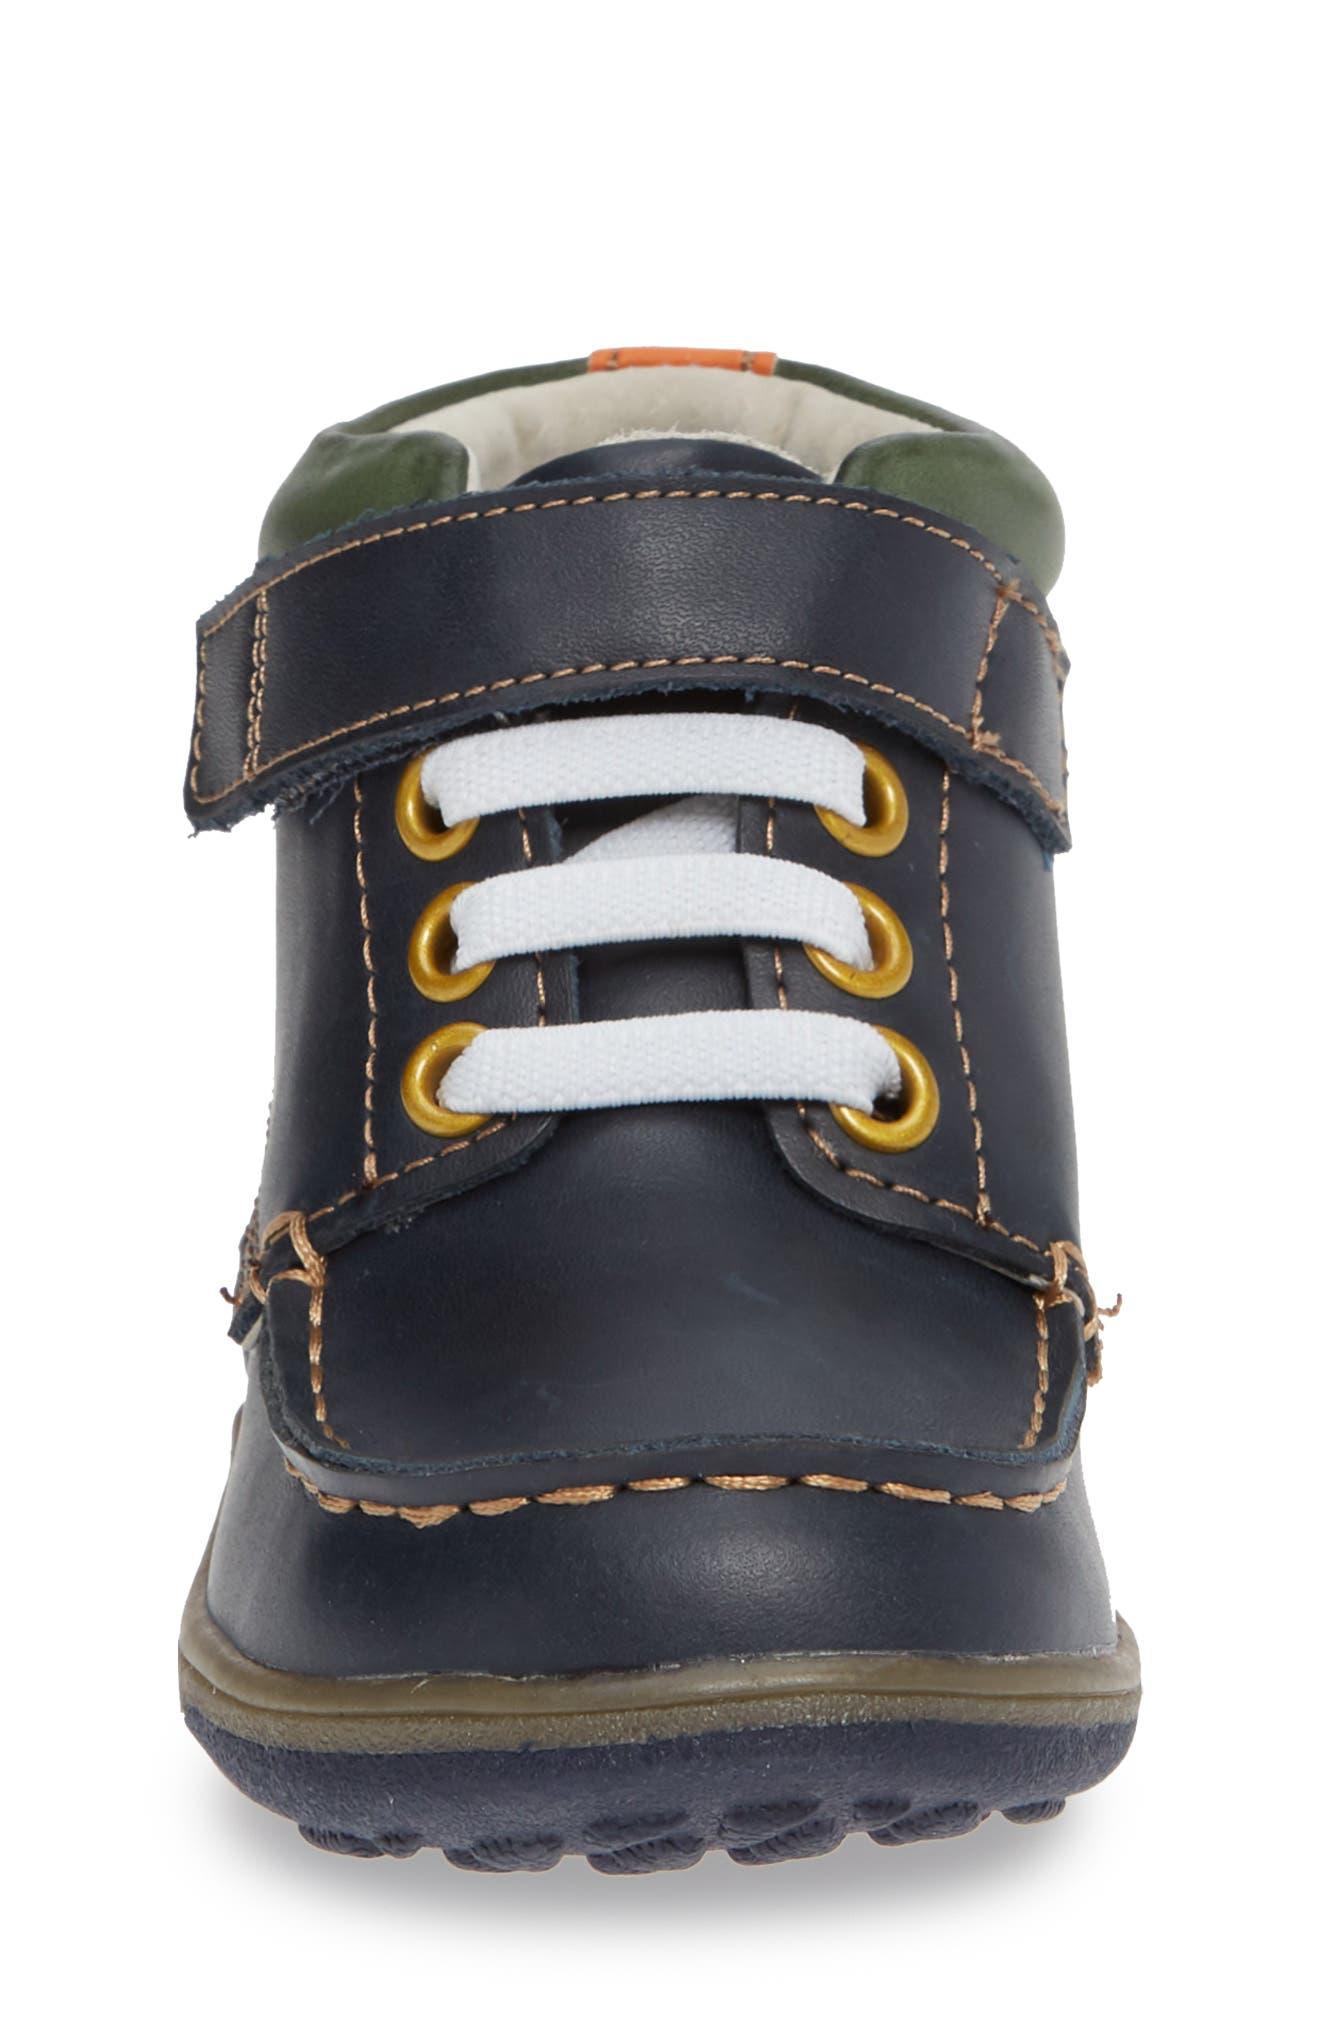 Owen High Top Sneaker Bootie,                             Alternate thumbnail 5, color,                             Navy